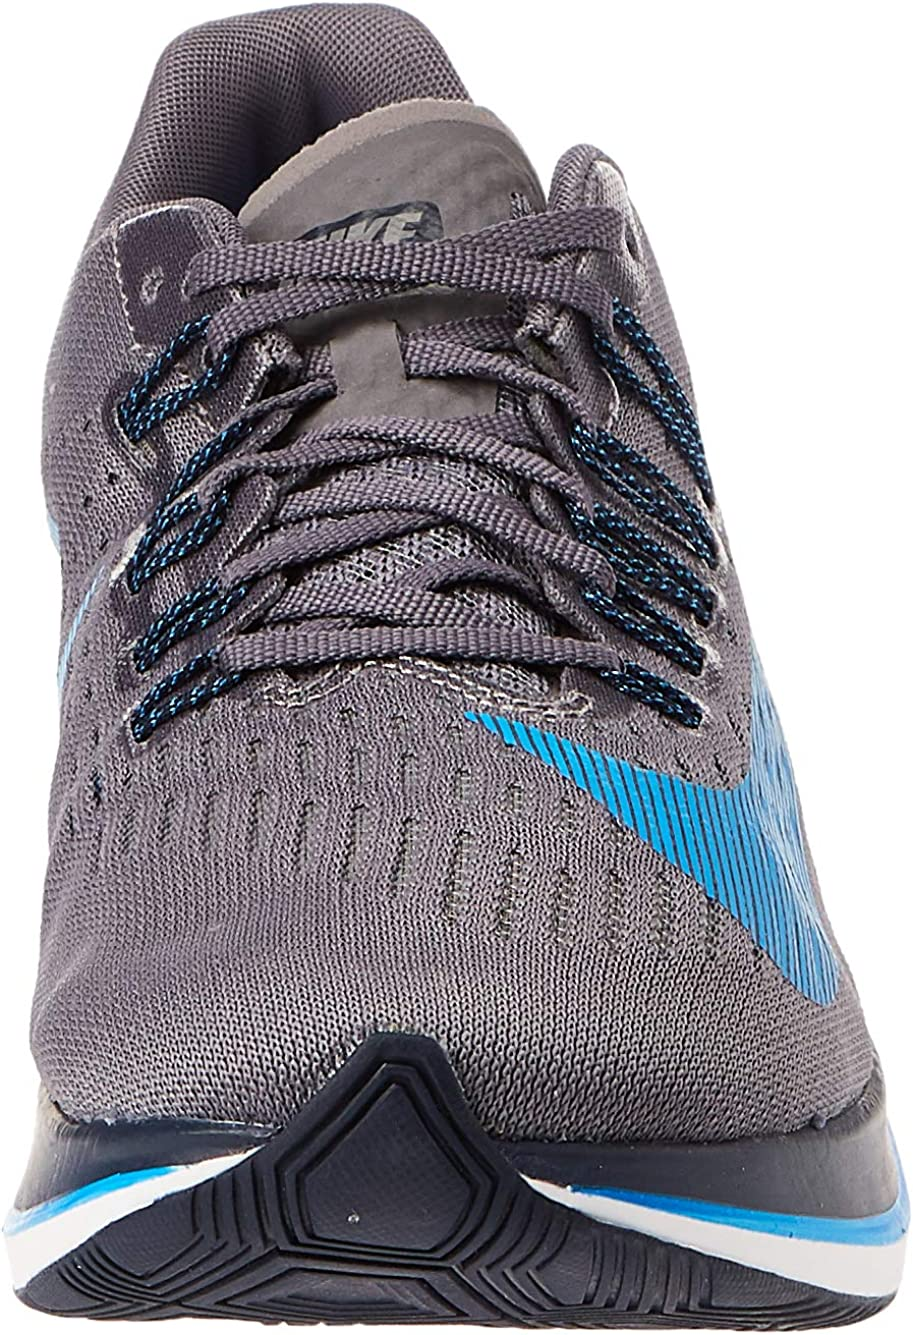 Nike Zoom Fly, Sneakers Basses Homme Multicolore Gunsmoke Blue Hero Obsidian Thunder Grey 001